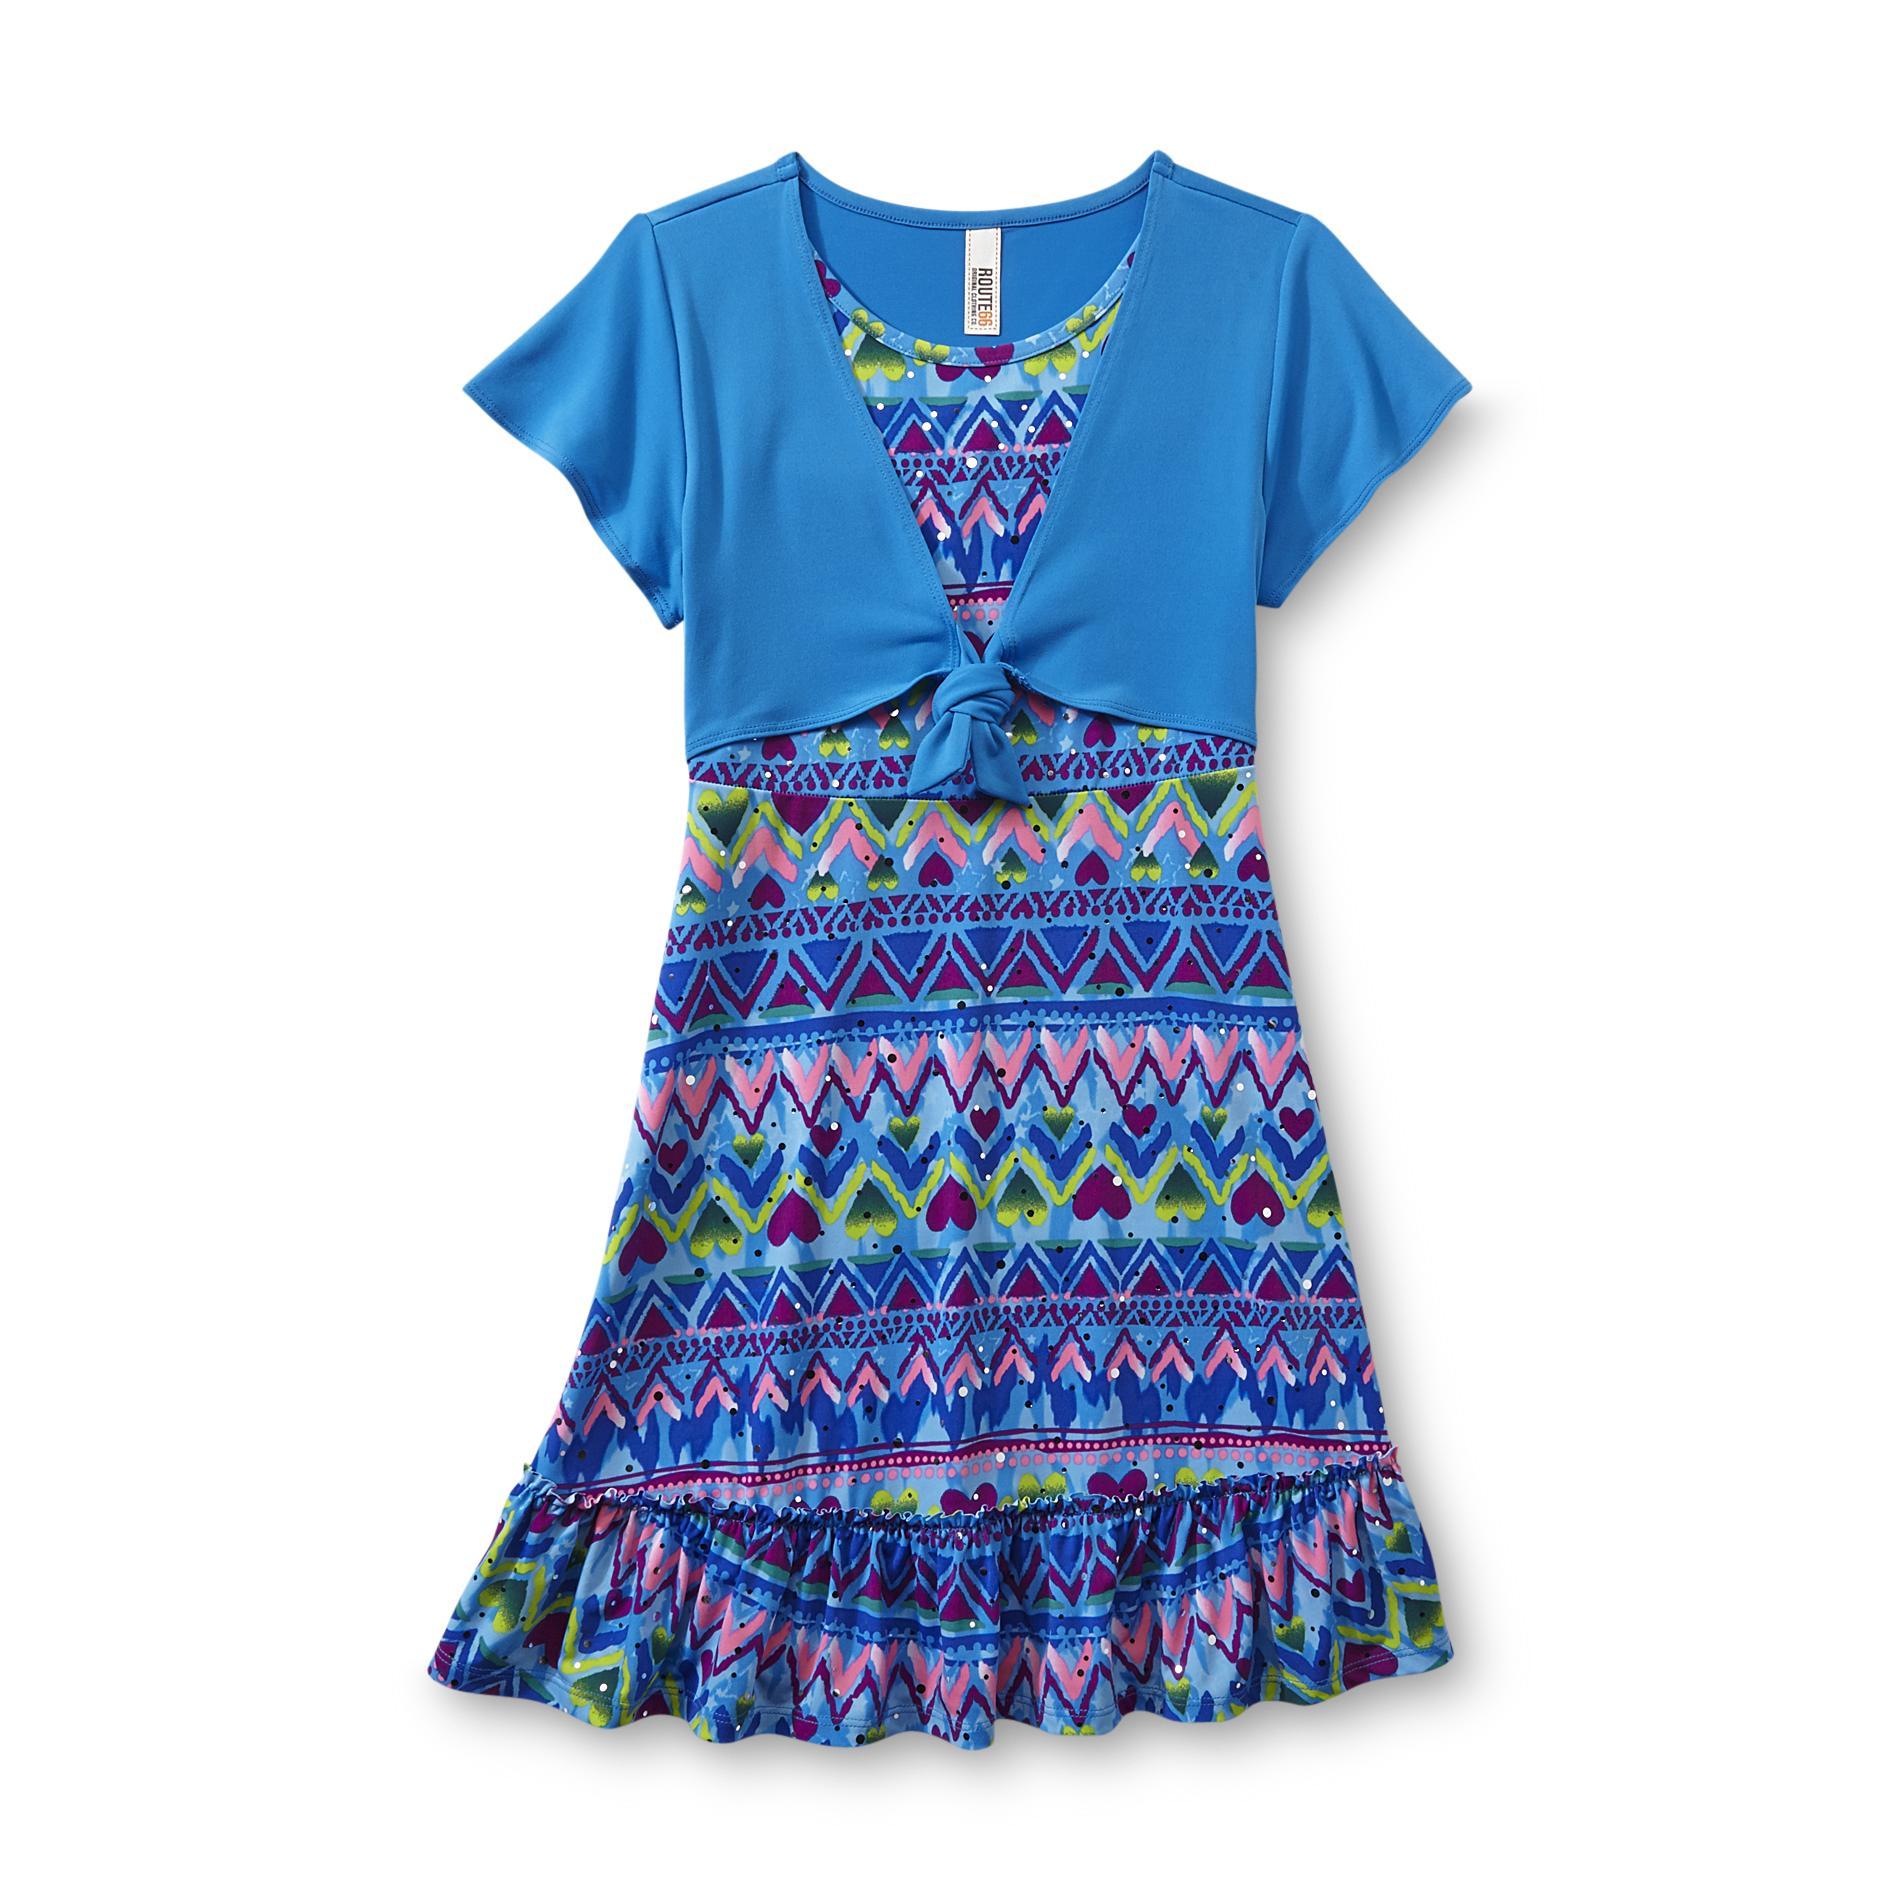 Route 66 Girl's Ruffled Dress - Geometric